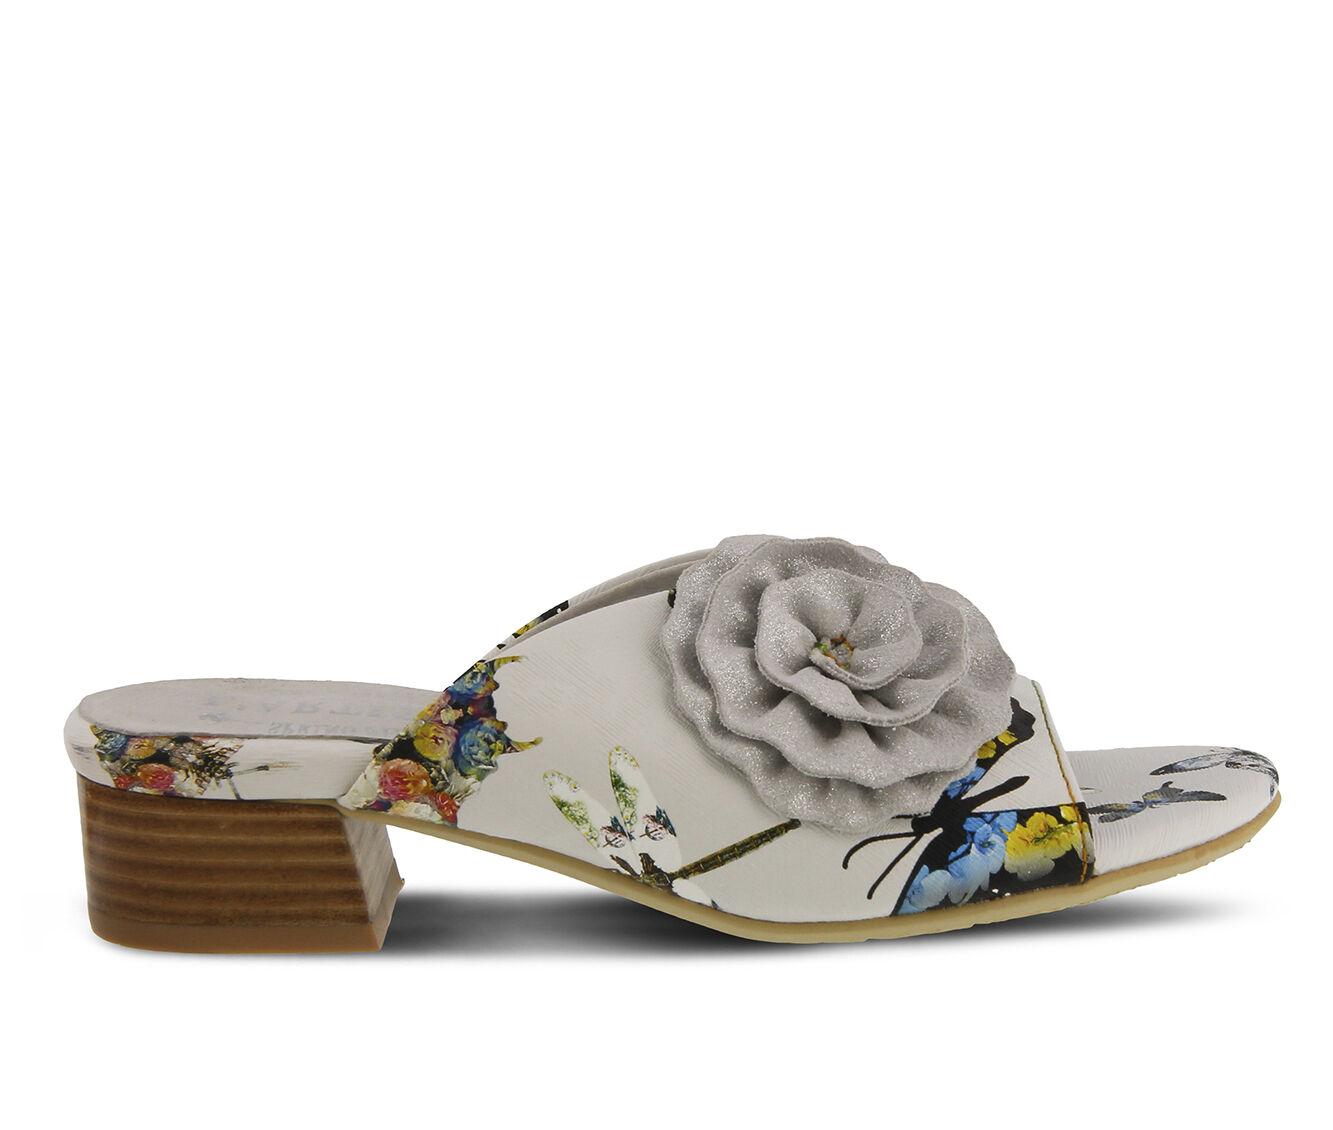 Women's L'ARTISTE Isittora Sandals White Multi